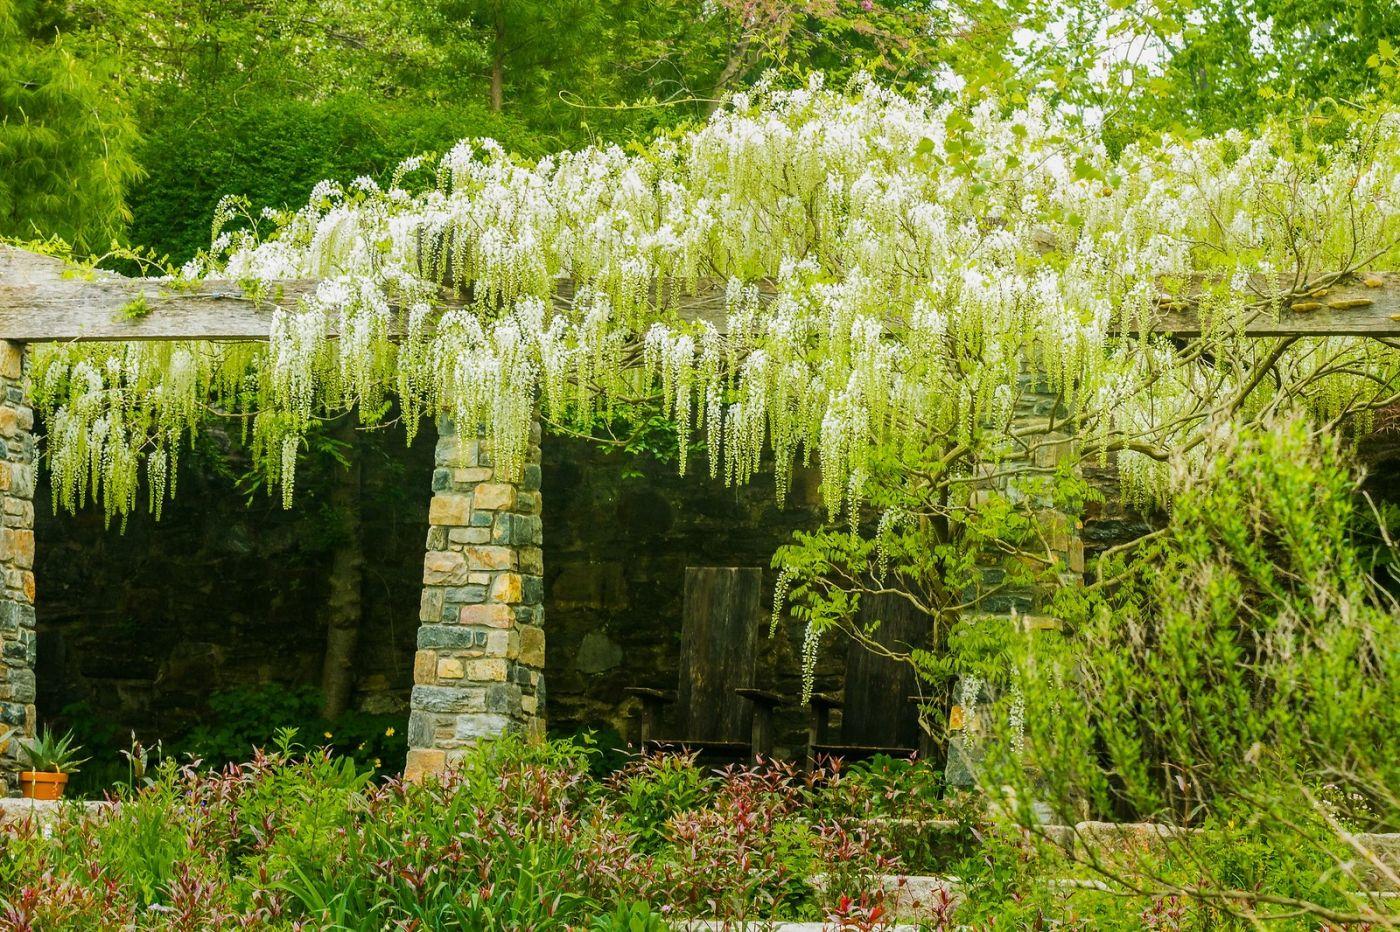 Chanticleer花园,那年盛开的紫藤花_图1-23